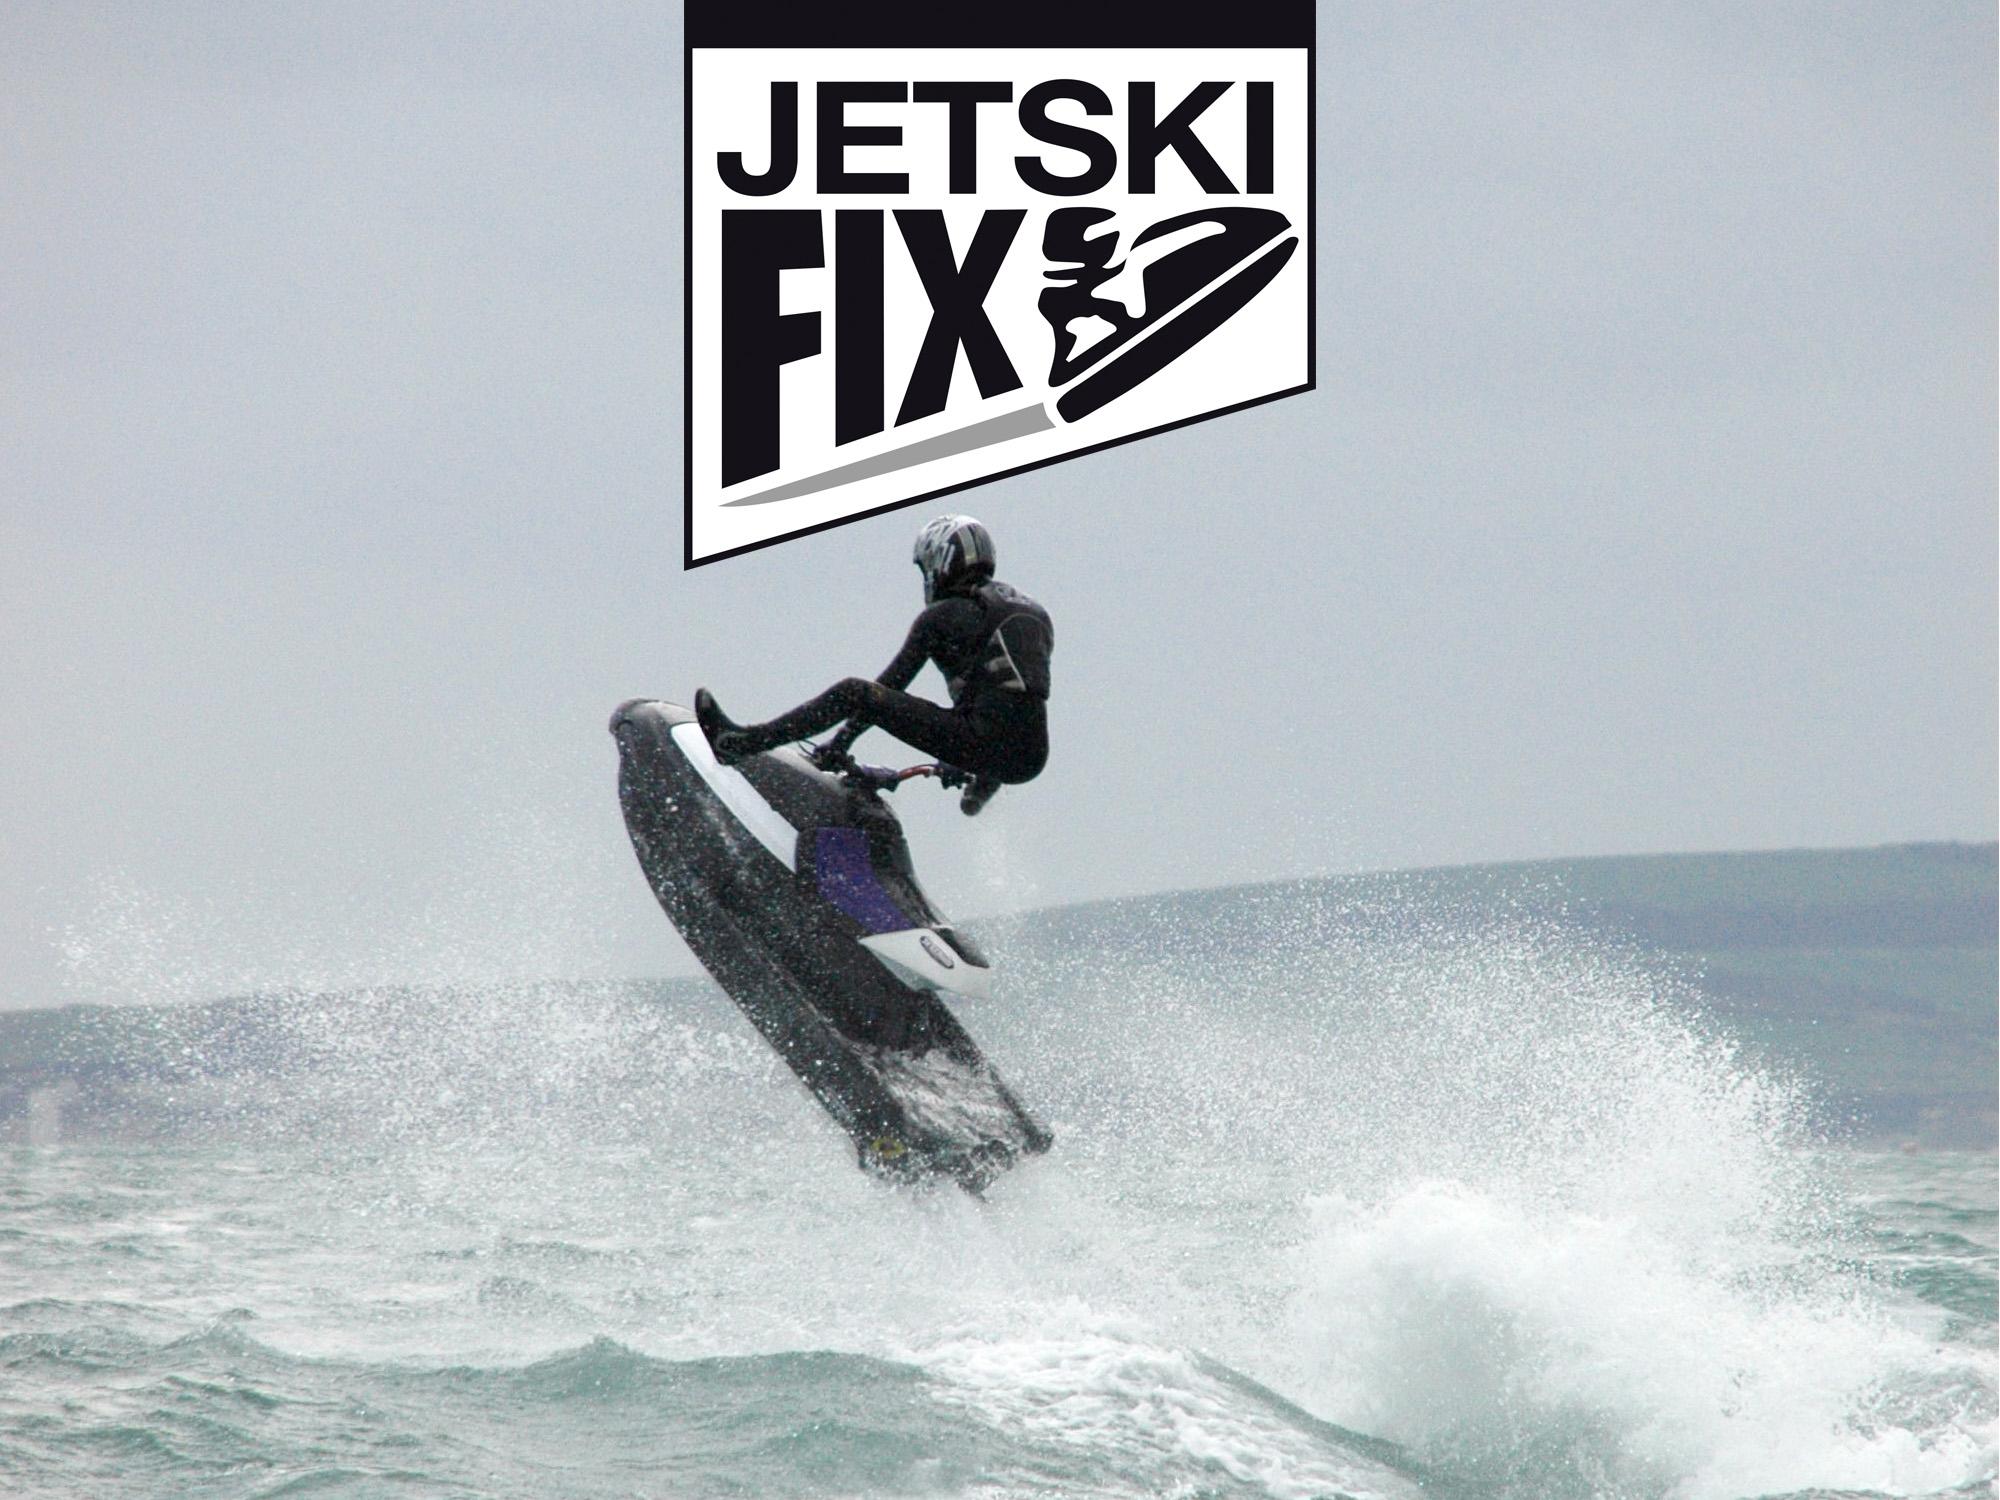 jetskifix no feet